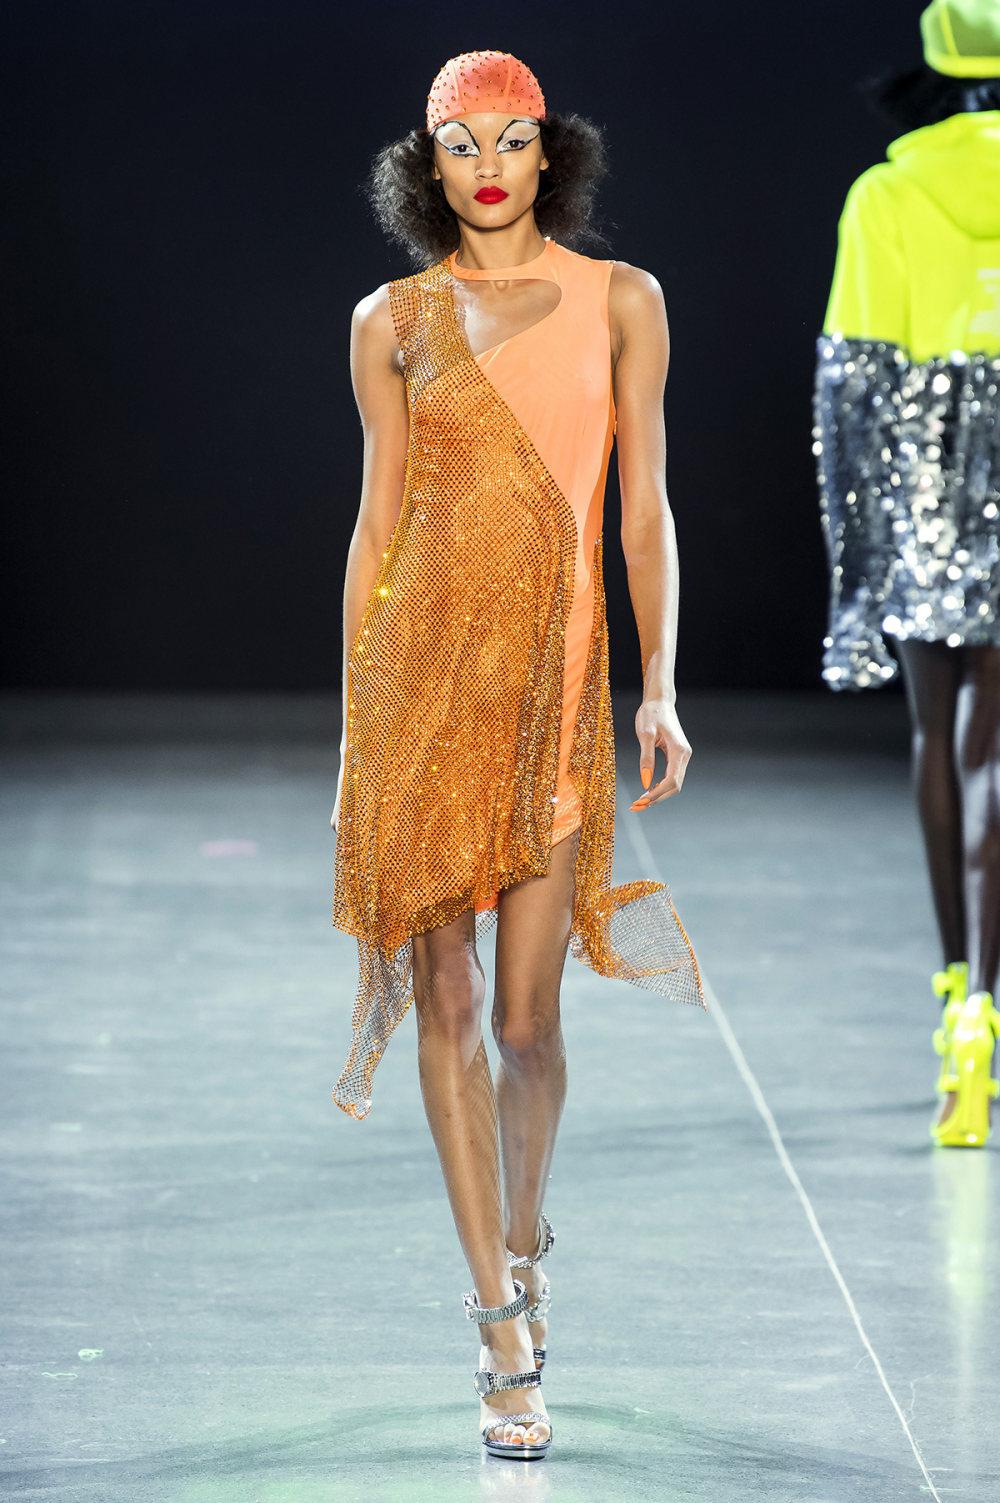 Christian Cowan时装系列虽然巨大的薄纱层状服装并没有那么特别-16.jpg